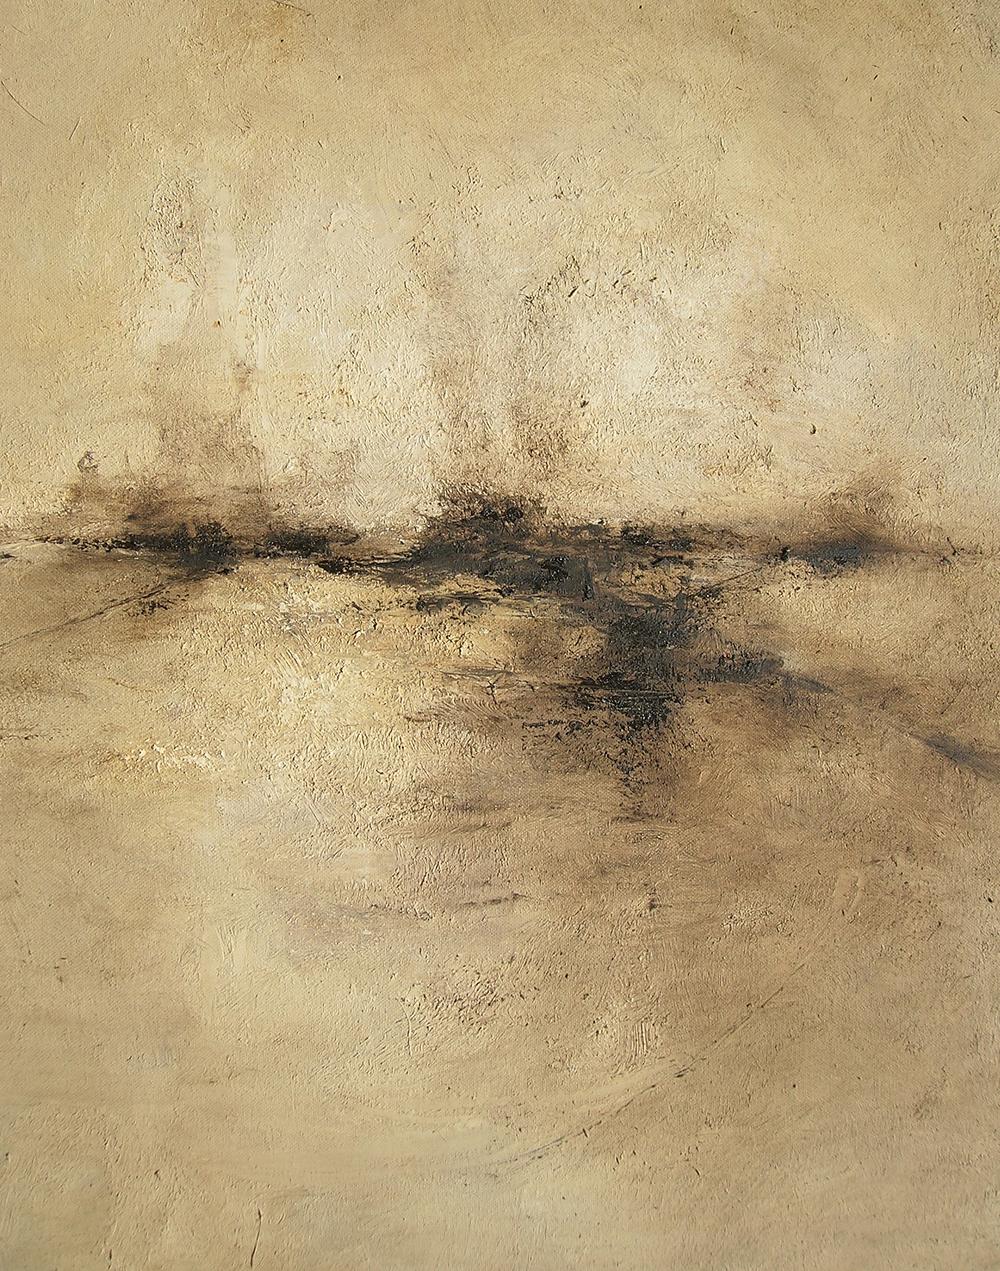 Untited (Landscape) 8